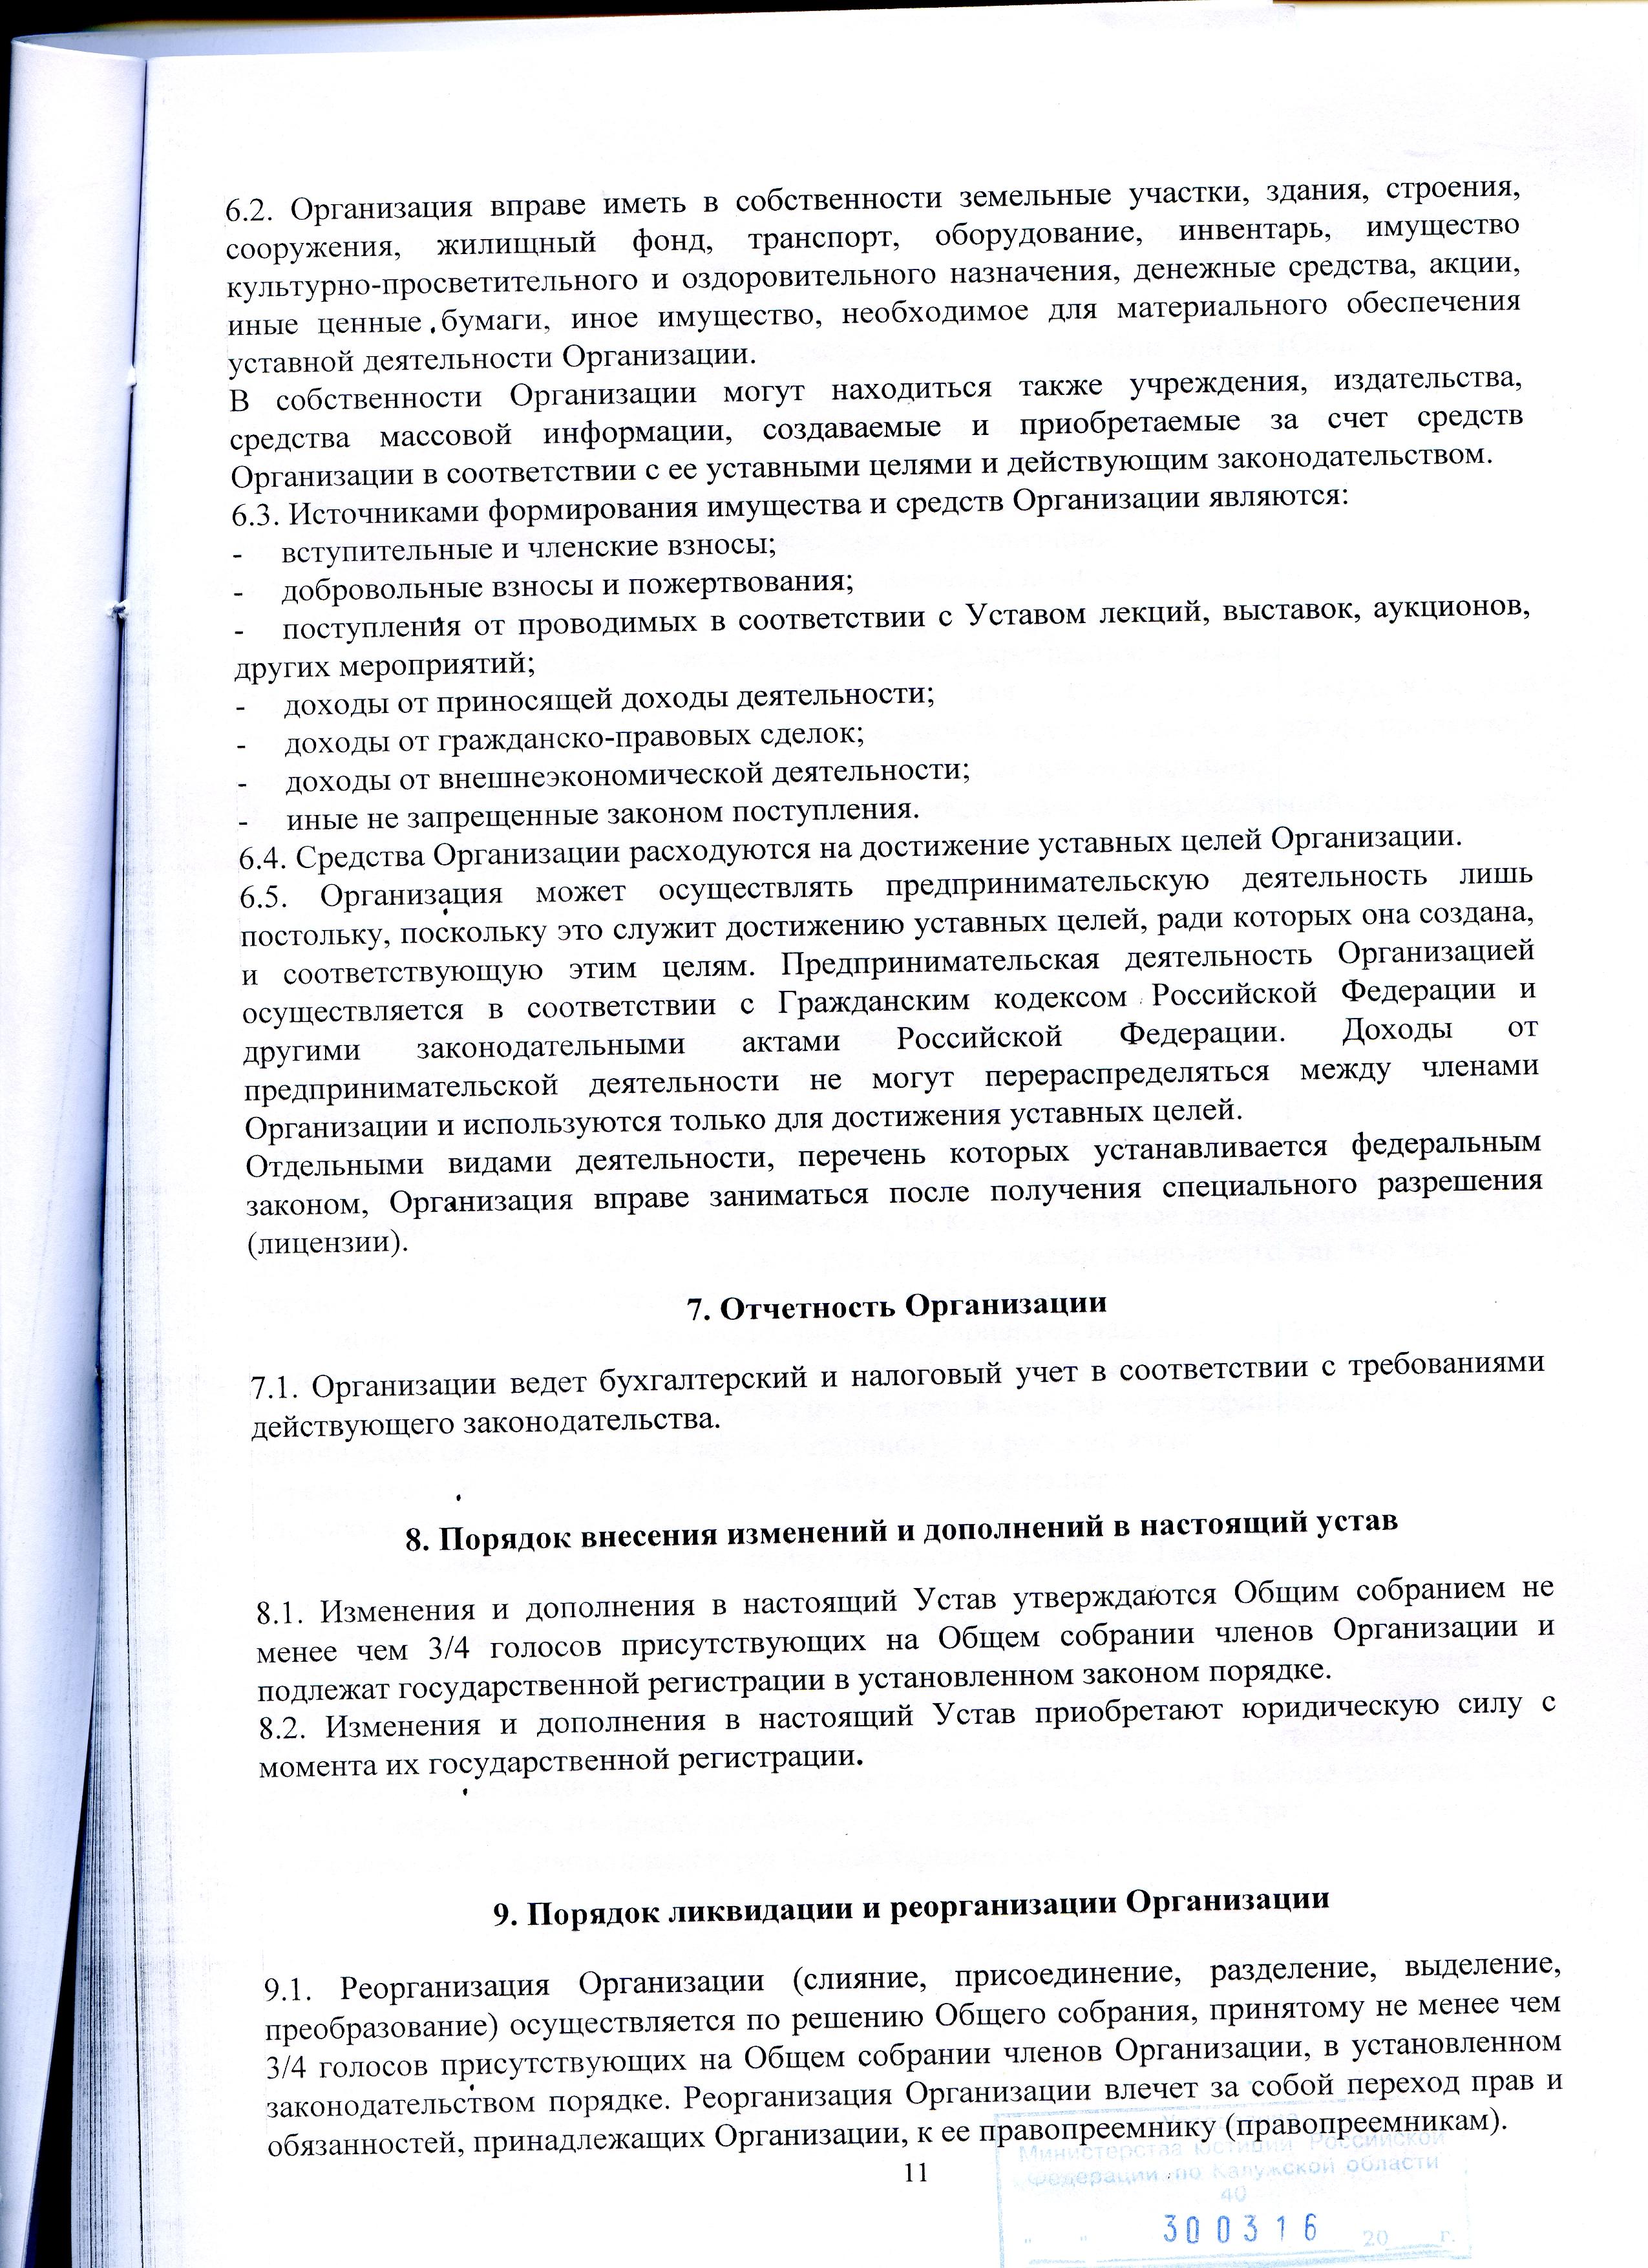 Устав НД 2 редакция073